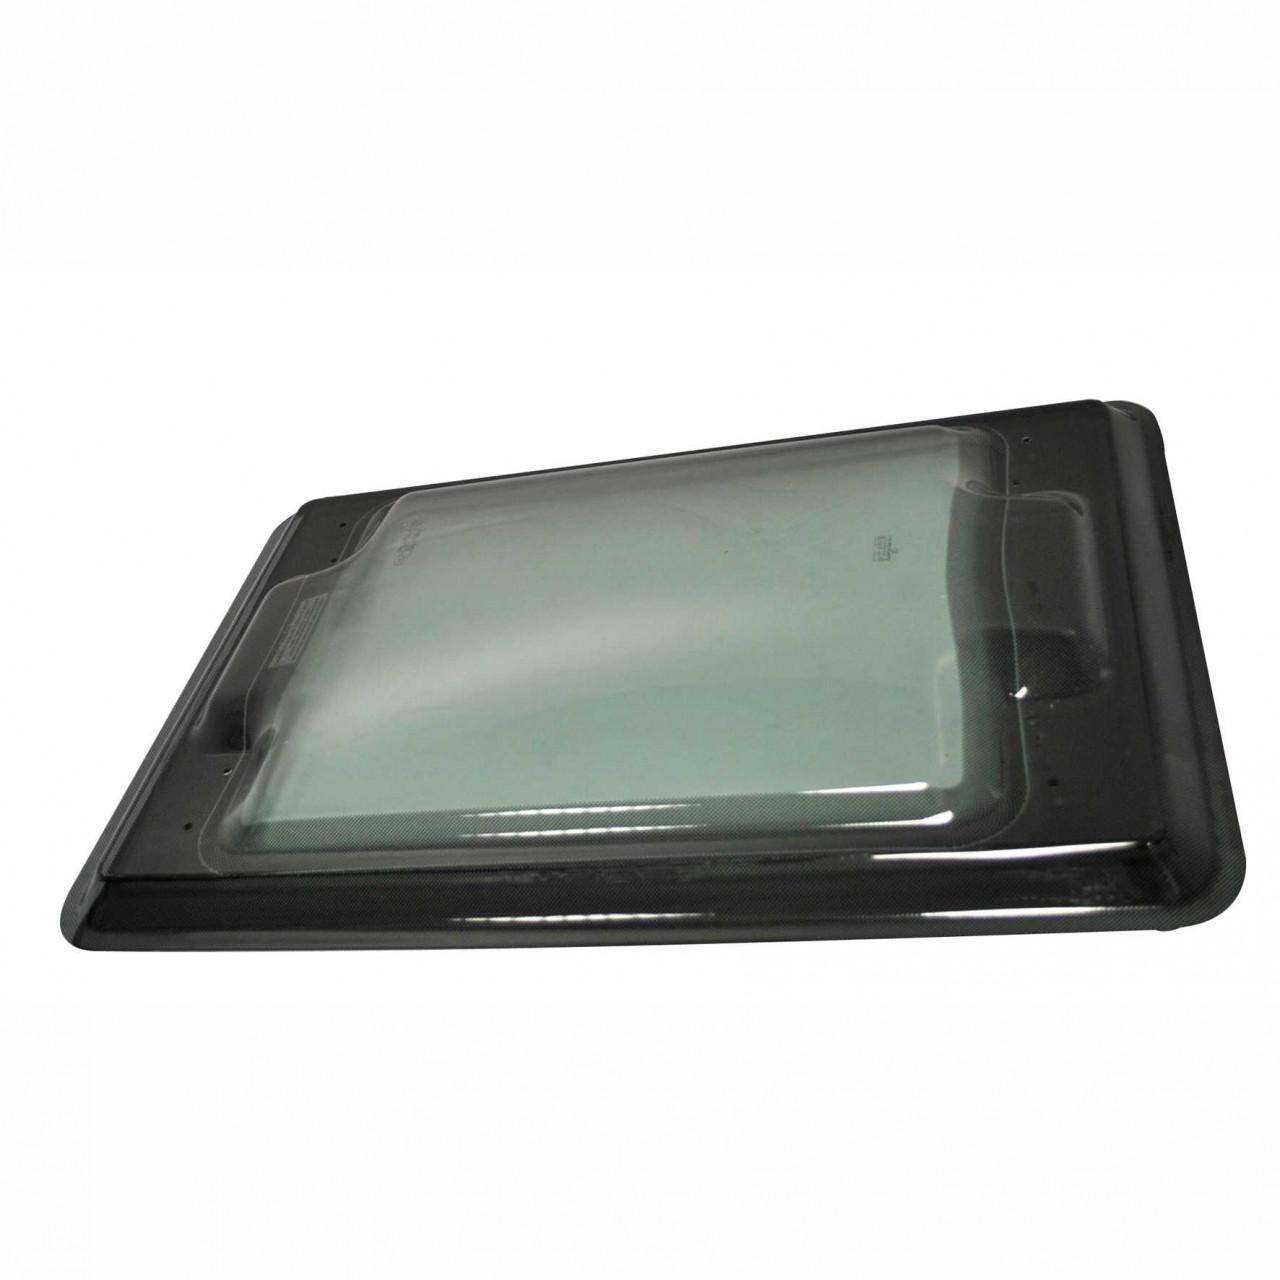 Hartal Haubendeckel für Dachhaube Multi 70 | 4041431043538